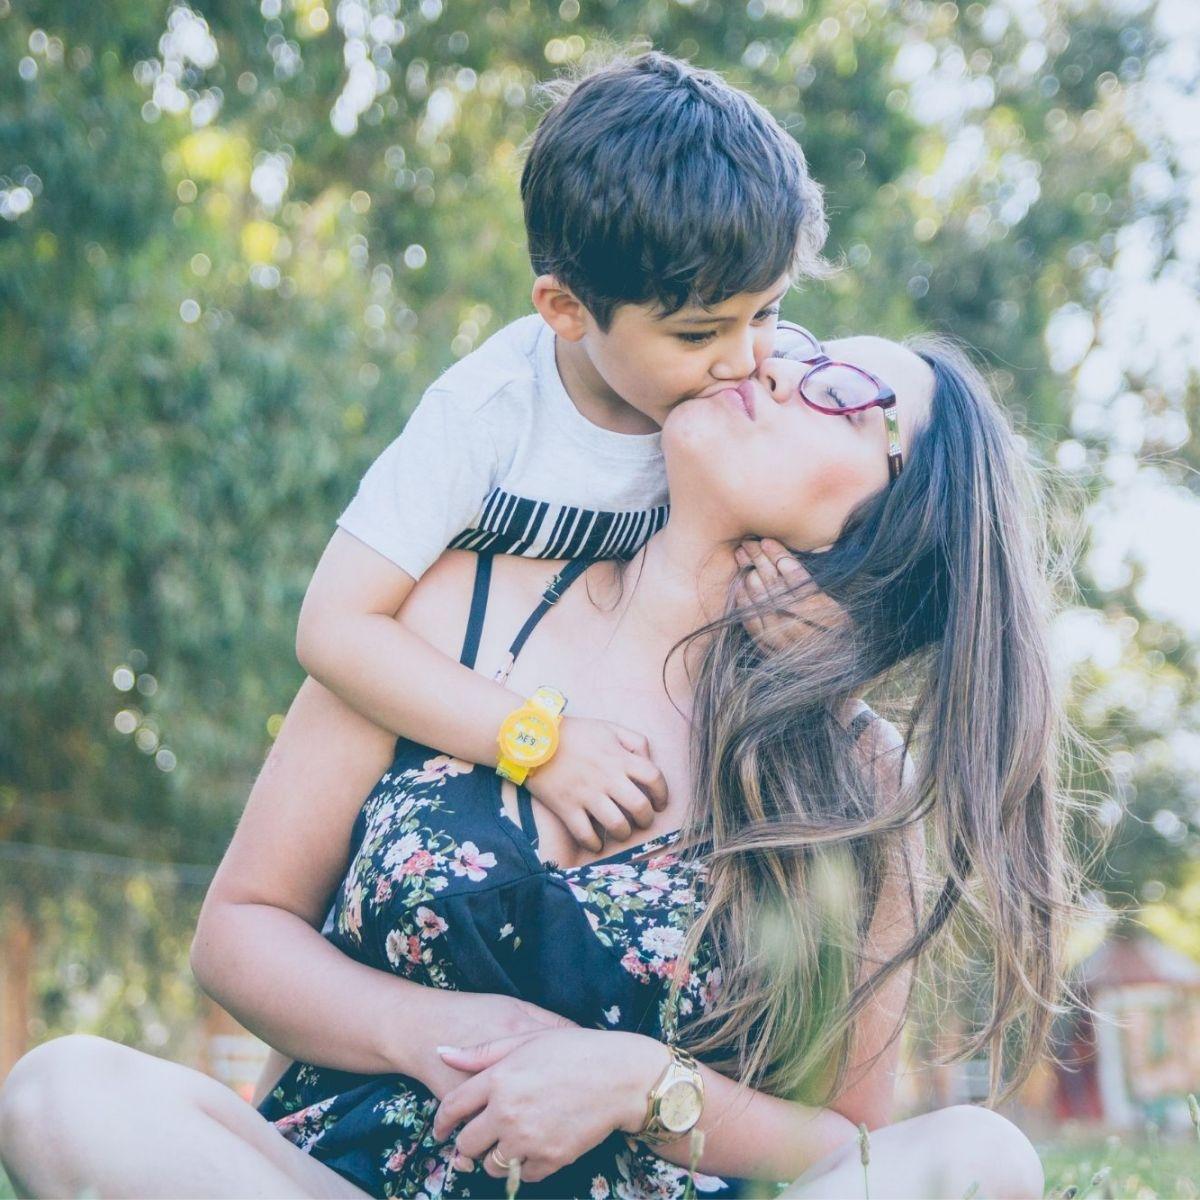 happy mom kissing her hild outside together